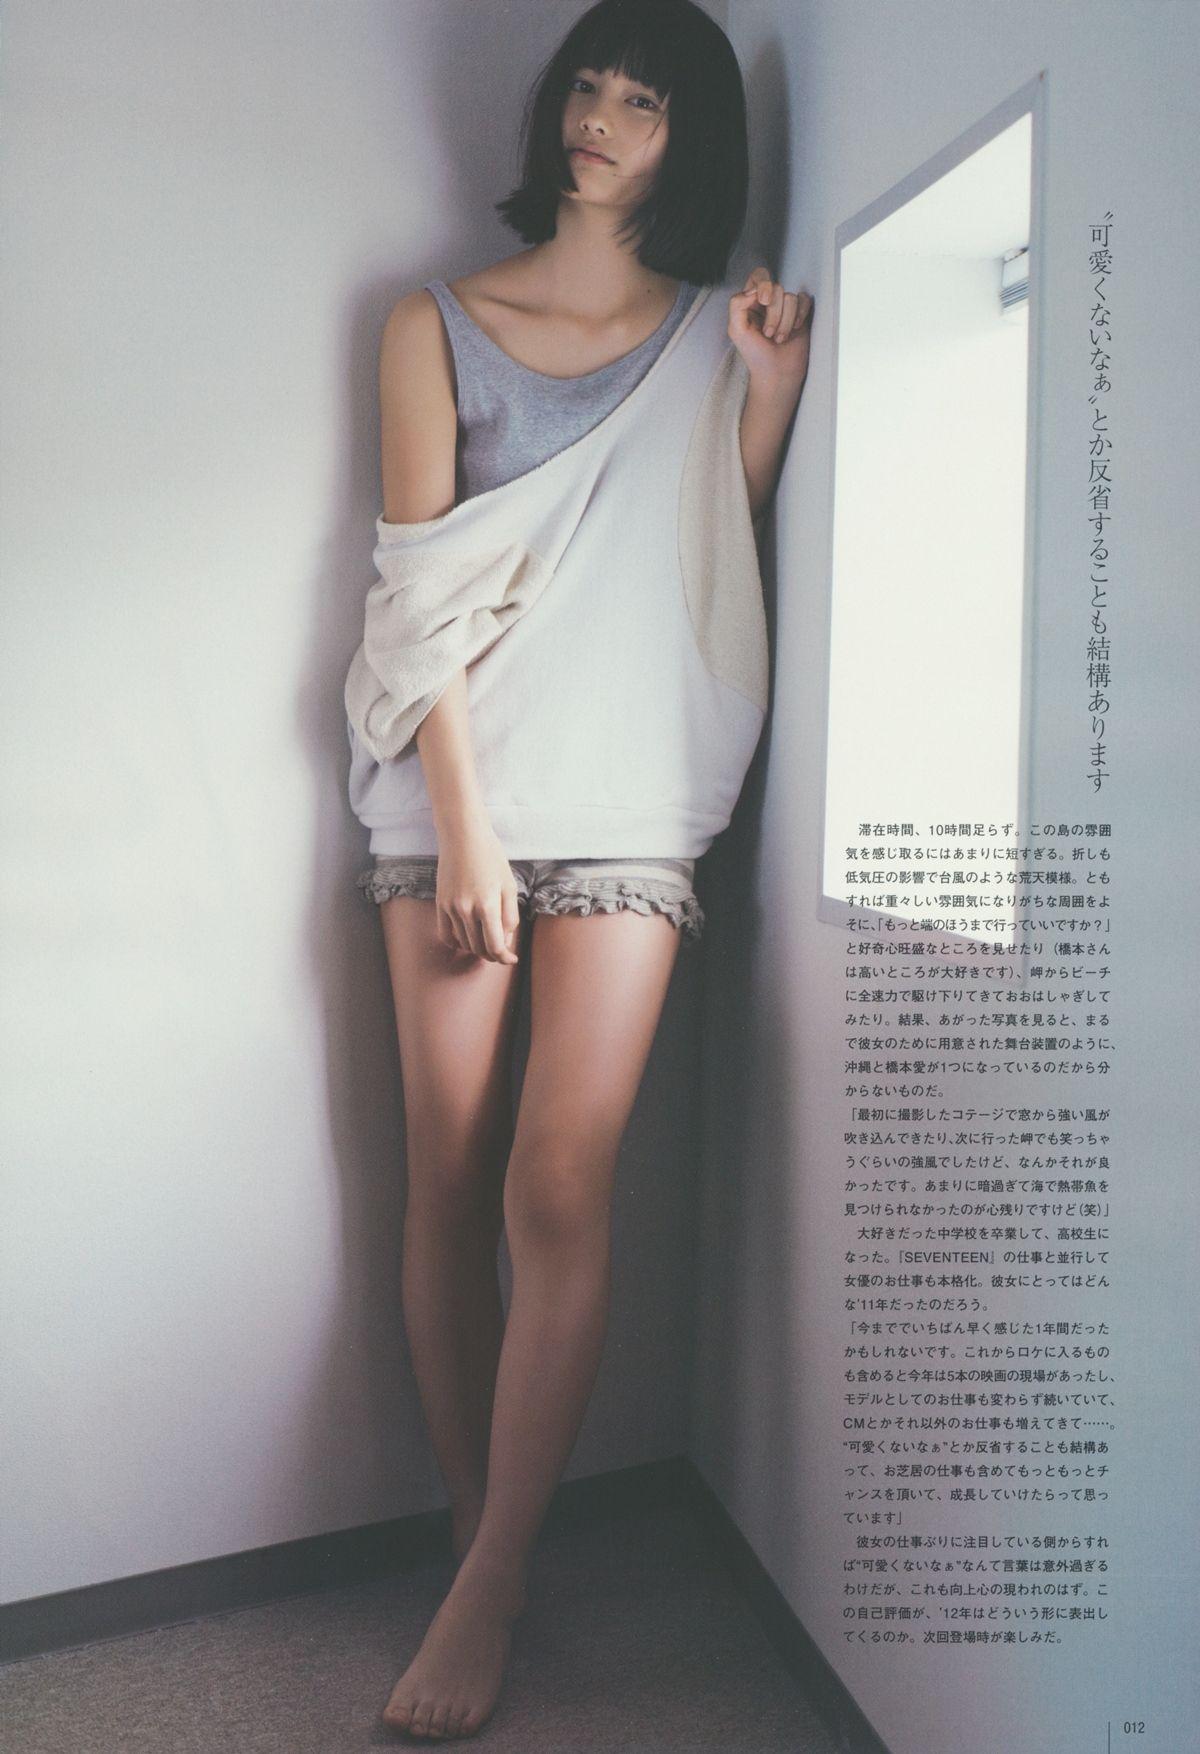 ai hashimoto | 橋本愛 Ai Hashimoto, Sweet Lady, Asian Beauty, Nice Girl